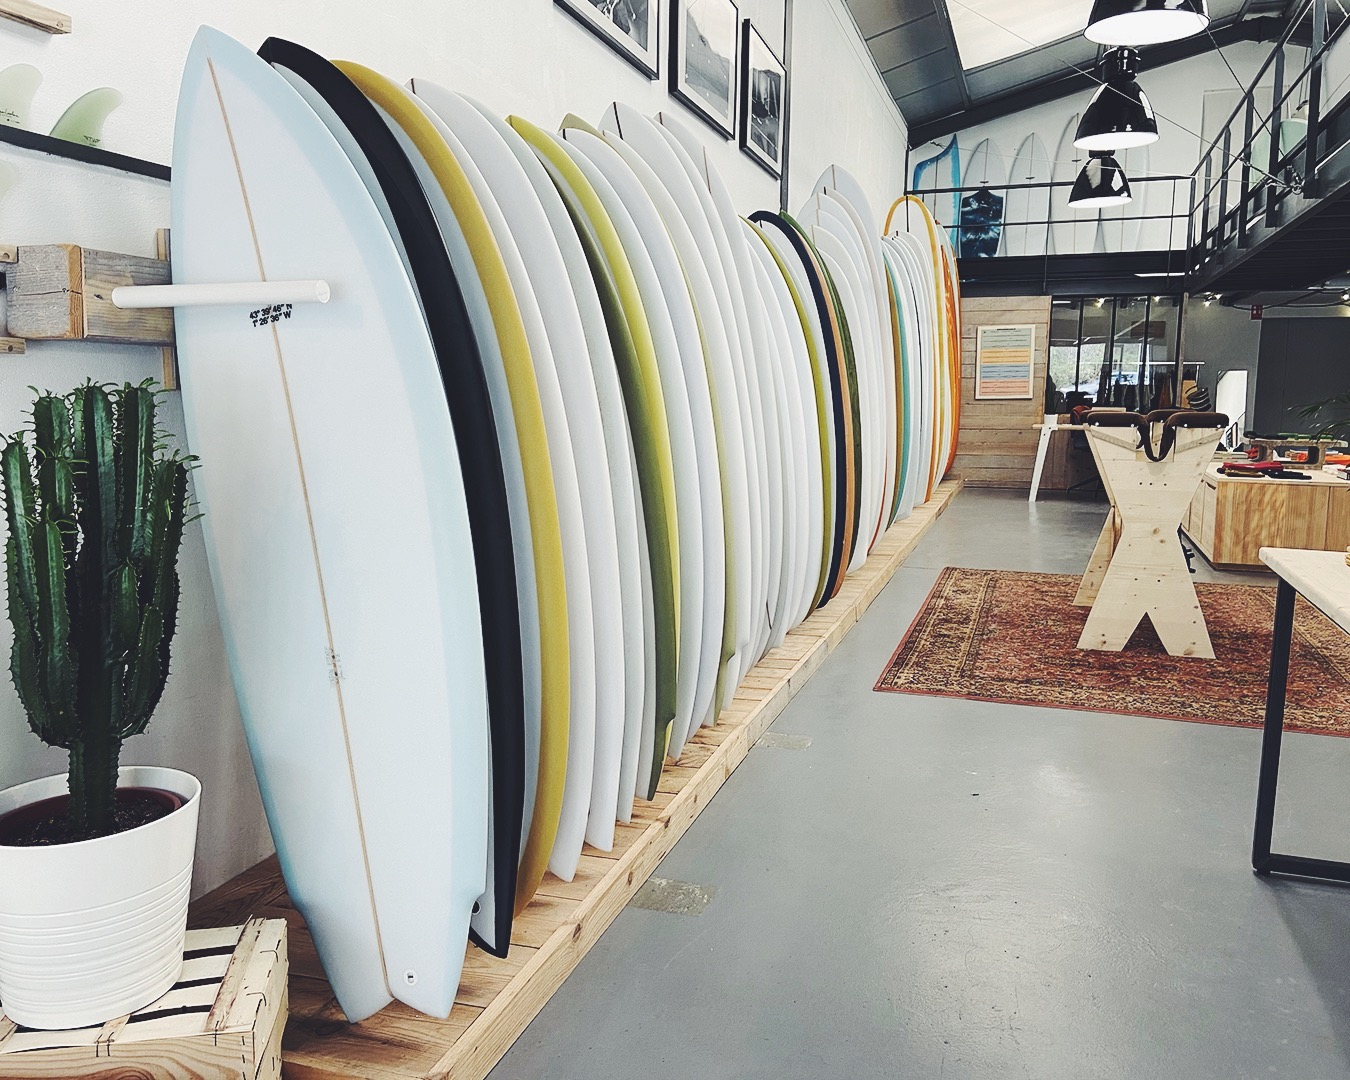 Surfinestate Surfin Estate surf shop brand surfboard clothing accessories apparel shape design culture Vincent Lemanceau Arthur Nelli France Hossegor